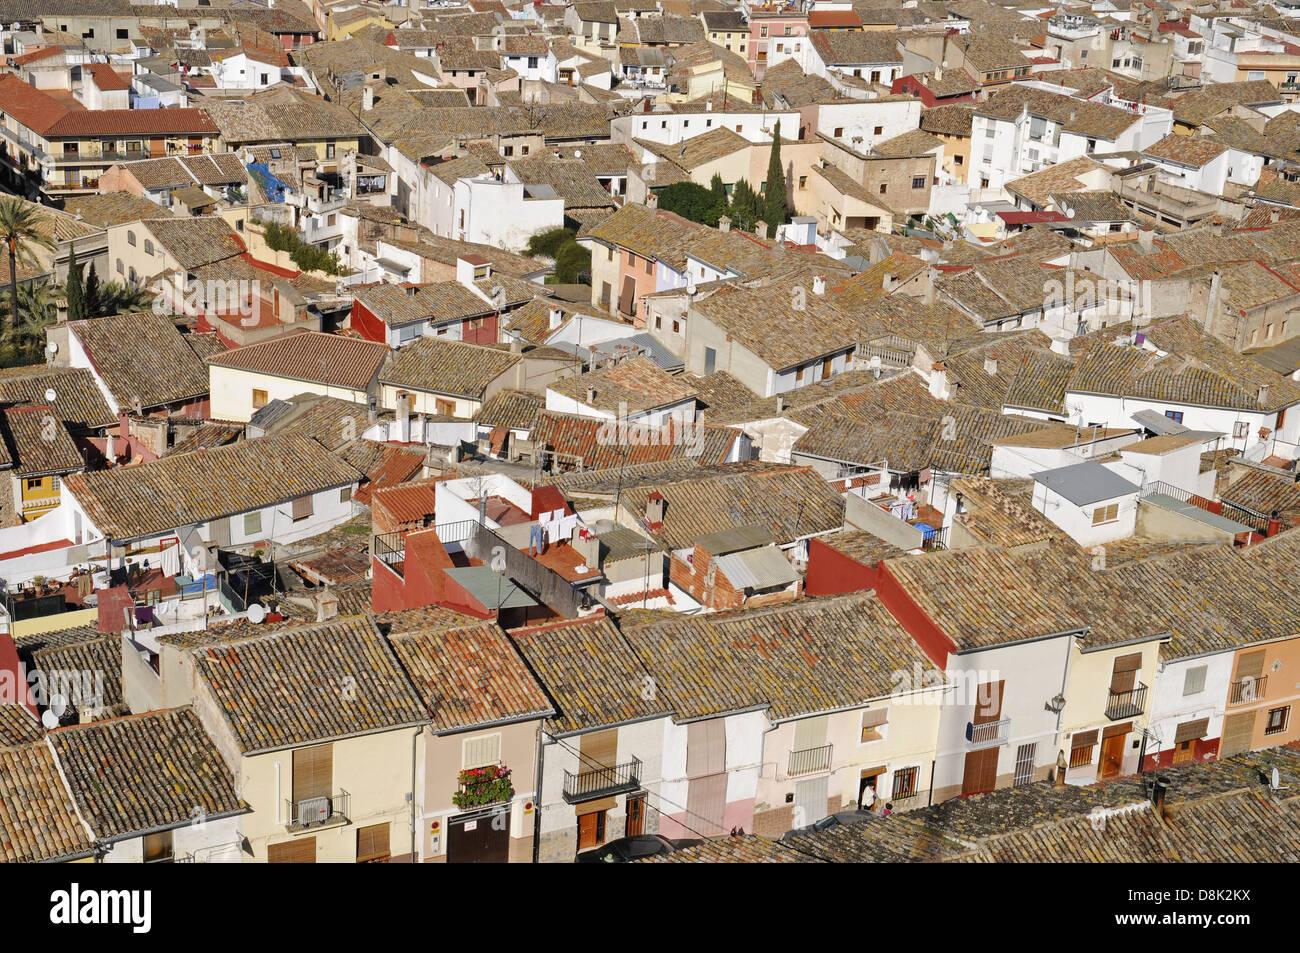 City View - Stock Image